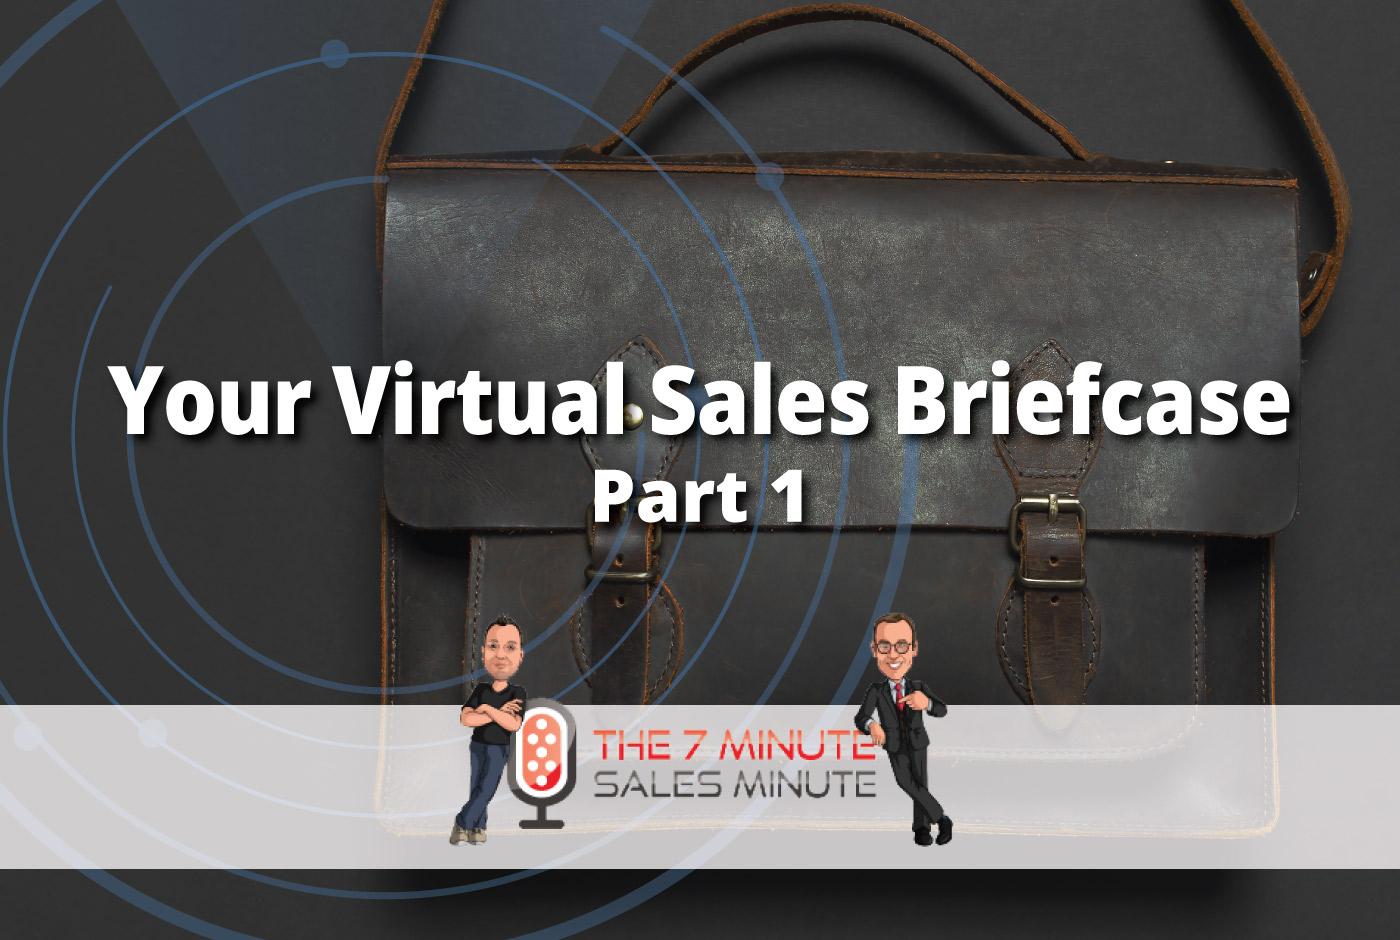 7 Minute Sales Minute Podcast - Season 13 - Episode 6 - Your Virtual Sales Briefcase - Part 1